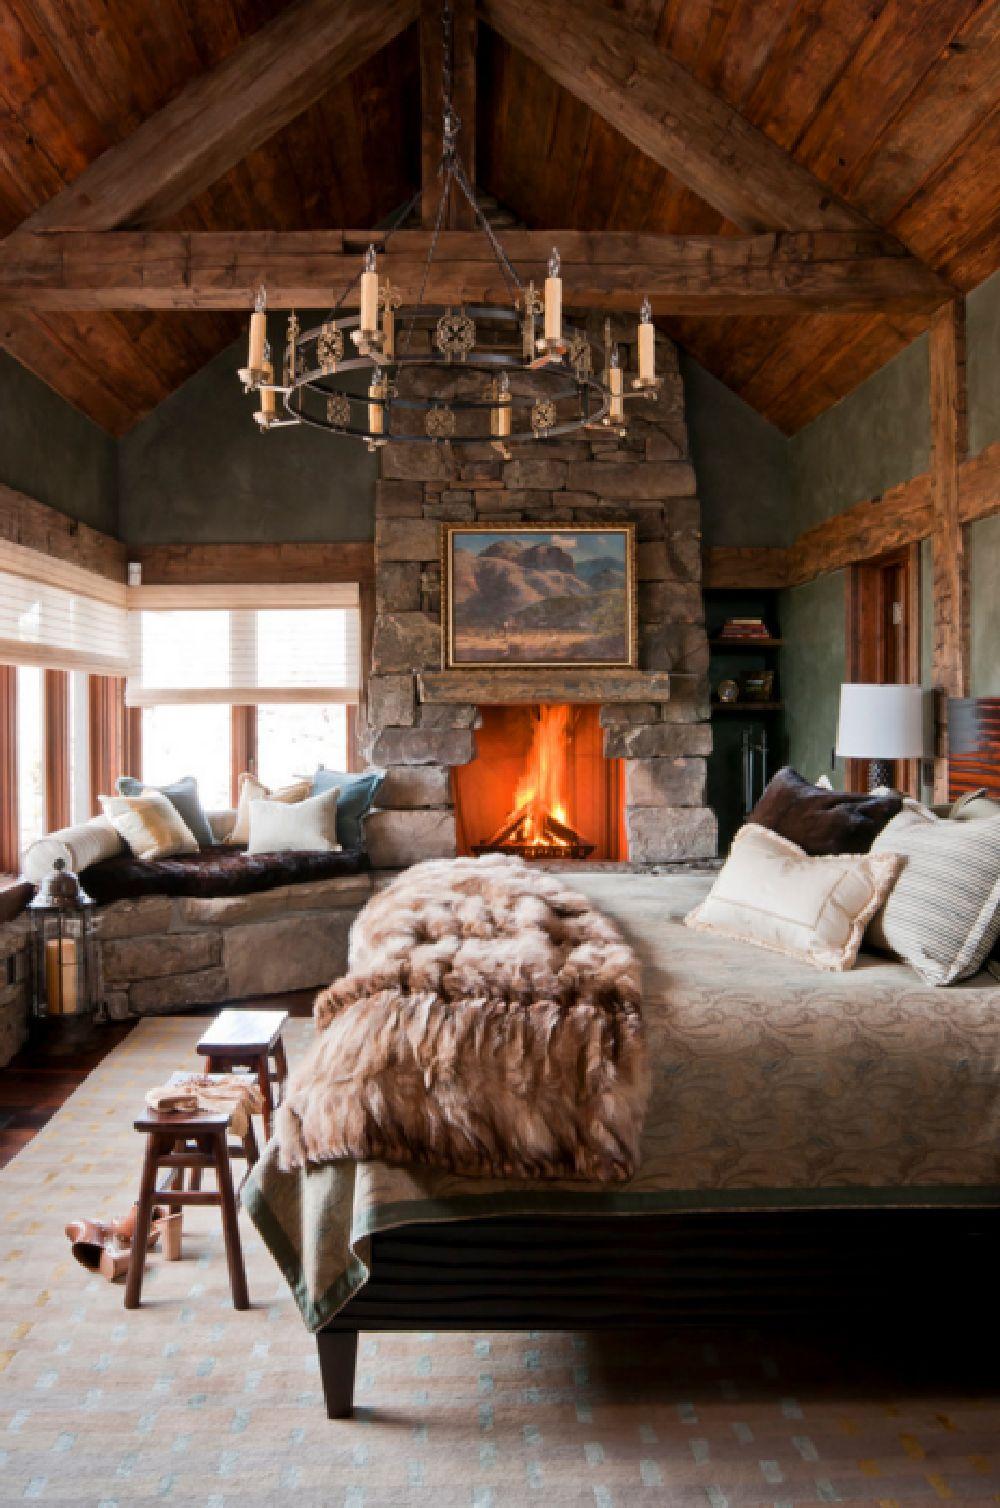 adelaparvu.com despre cabana de munte, Alpine Dancing Hearts, Monta SUA, arh Larry Pearson, designer de interior Debra Shull, Foto Yellowstone Traditions (5)